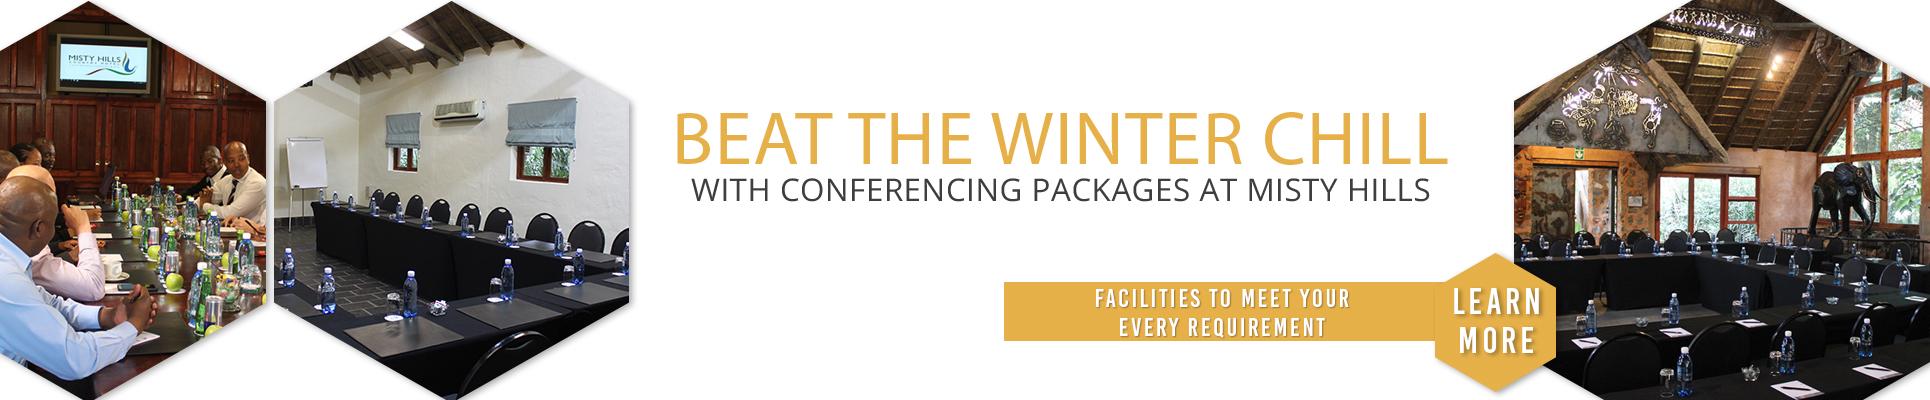 Misty Hills Winter Conference Specials in Muldersdrift Gauteng